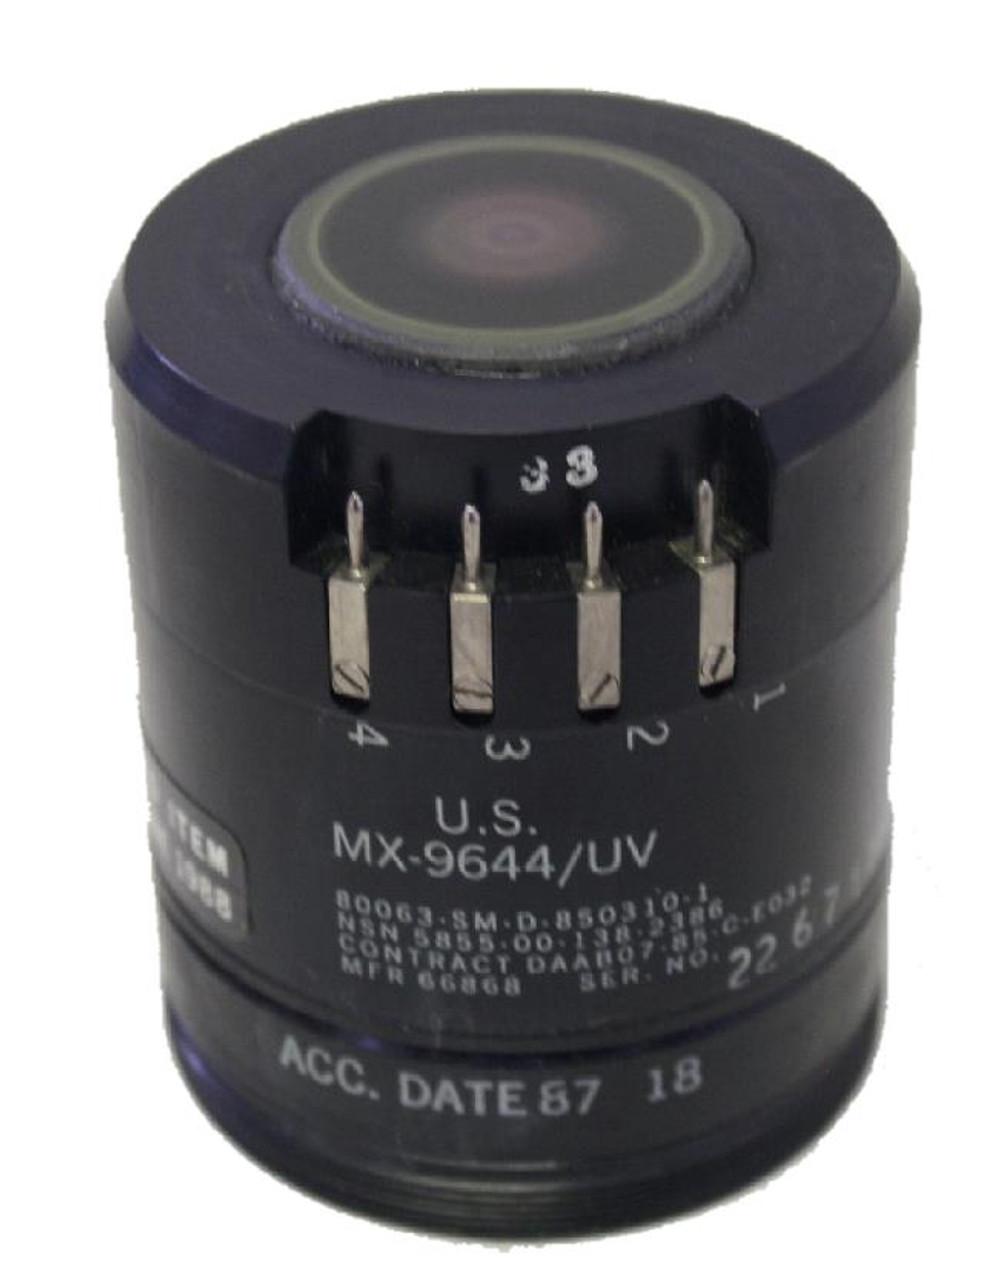 MX-9644/UV Night Vision Image Intensifier Tube for AN/PVS-4 TVS-5, Gen 2, USED